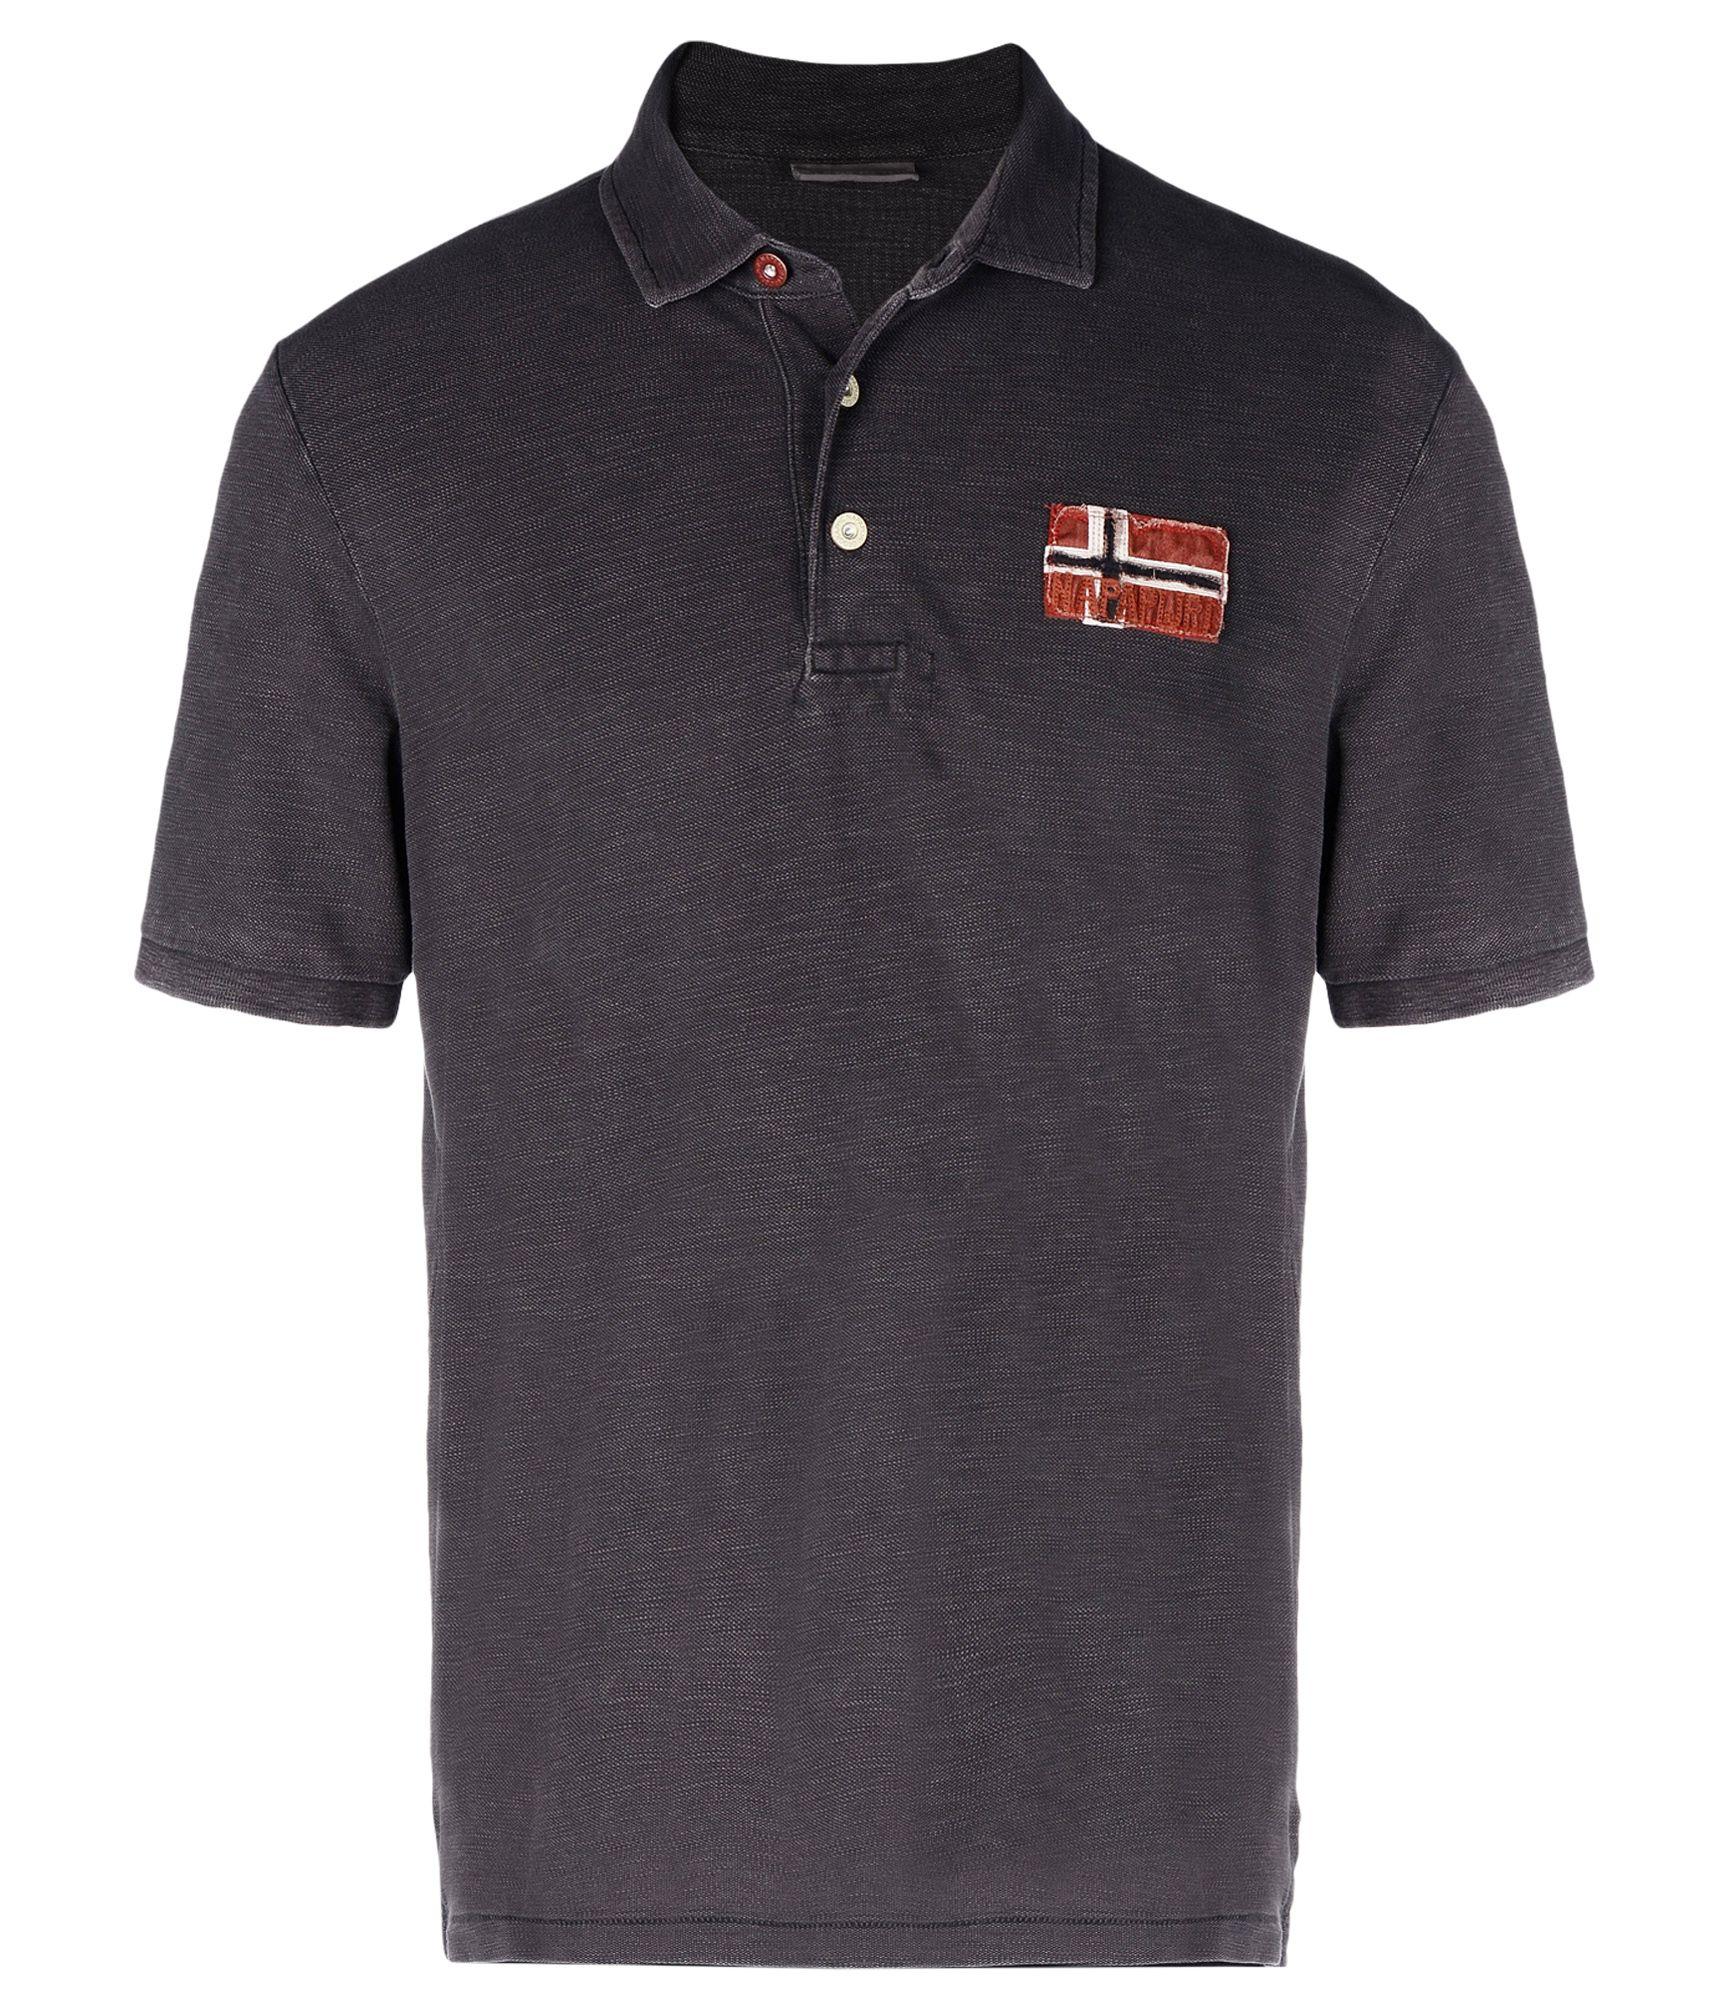 napapijri polo shirt in gray for men lyst. Black Bedroom Furniture Sets. Home Design Ideas